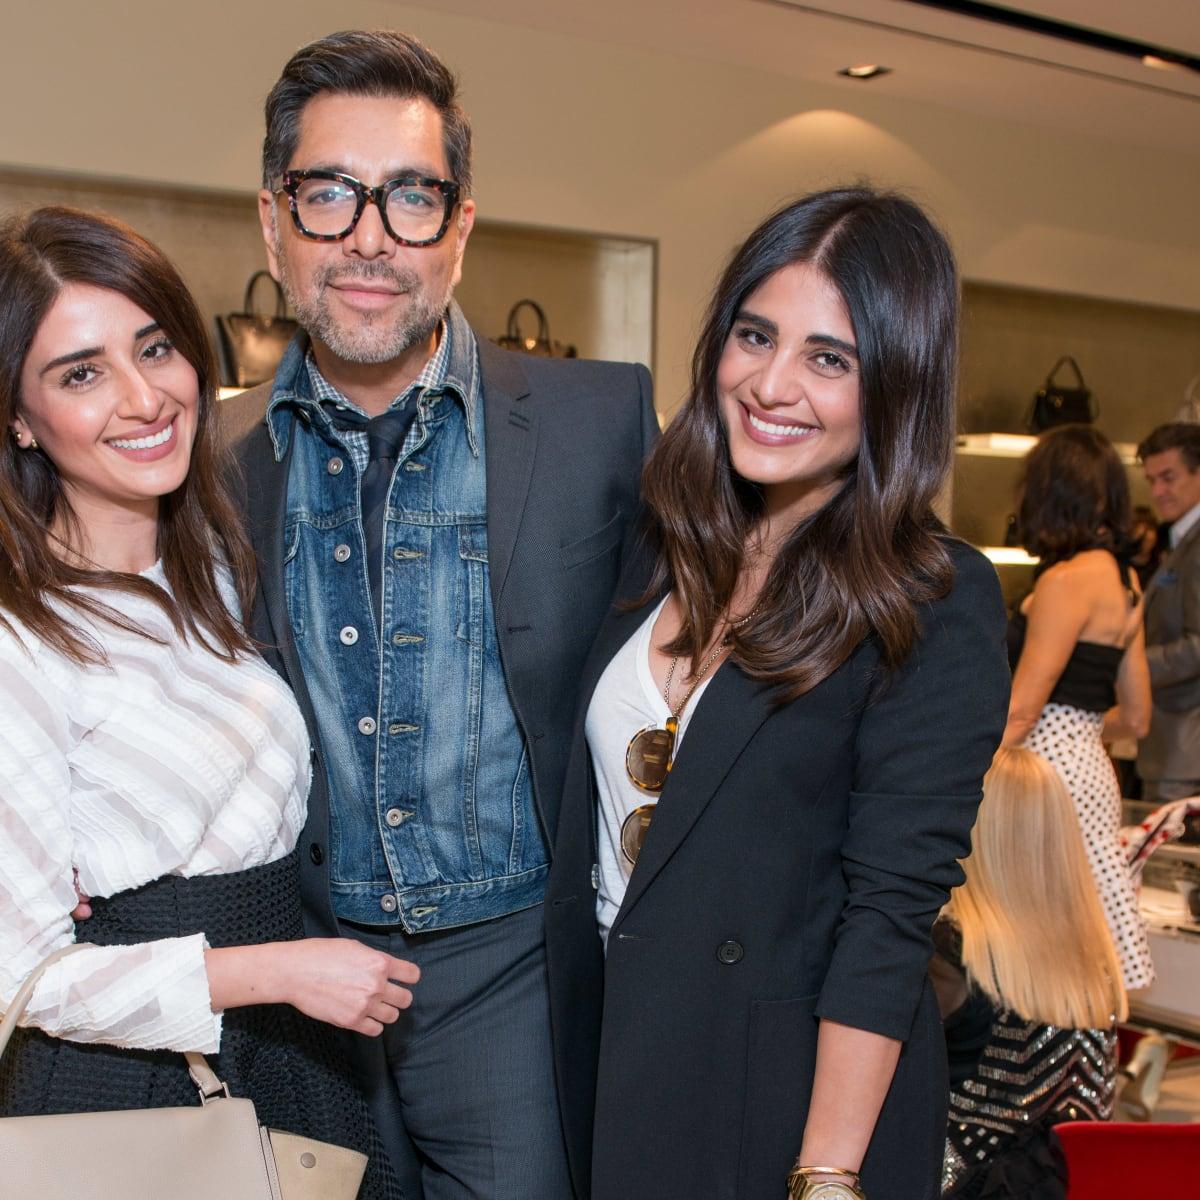 News, Shelby, Heart of Fashion Valentino party, Sept. 2015, Saba Jawda, Ceron, Sarah Jawda